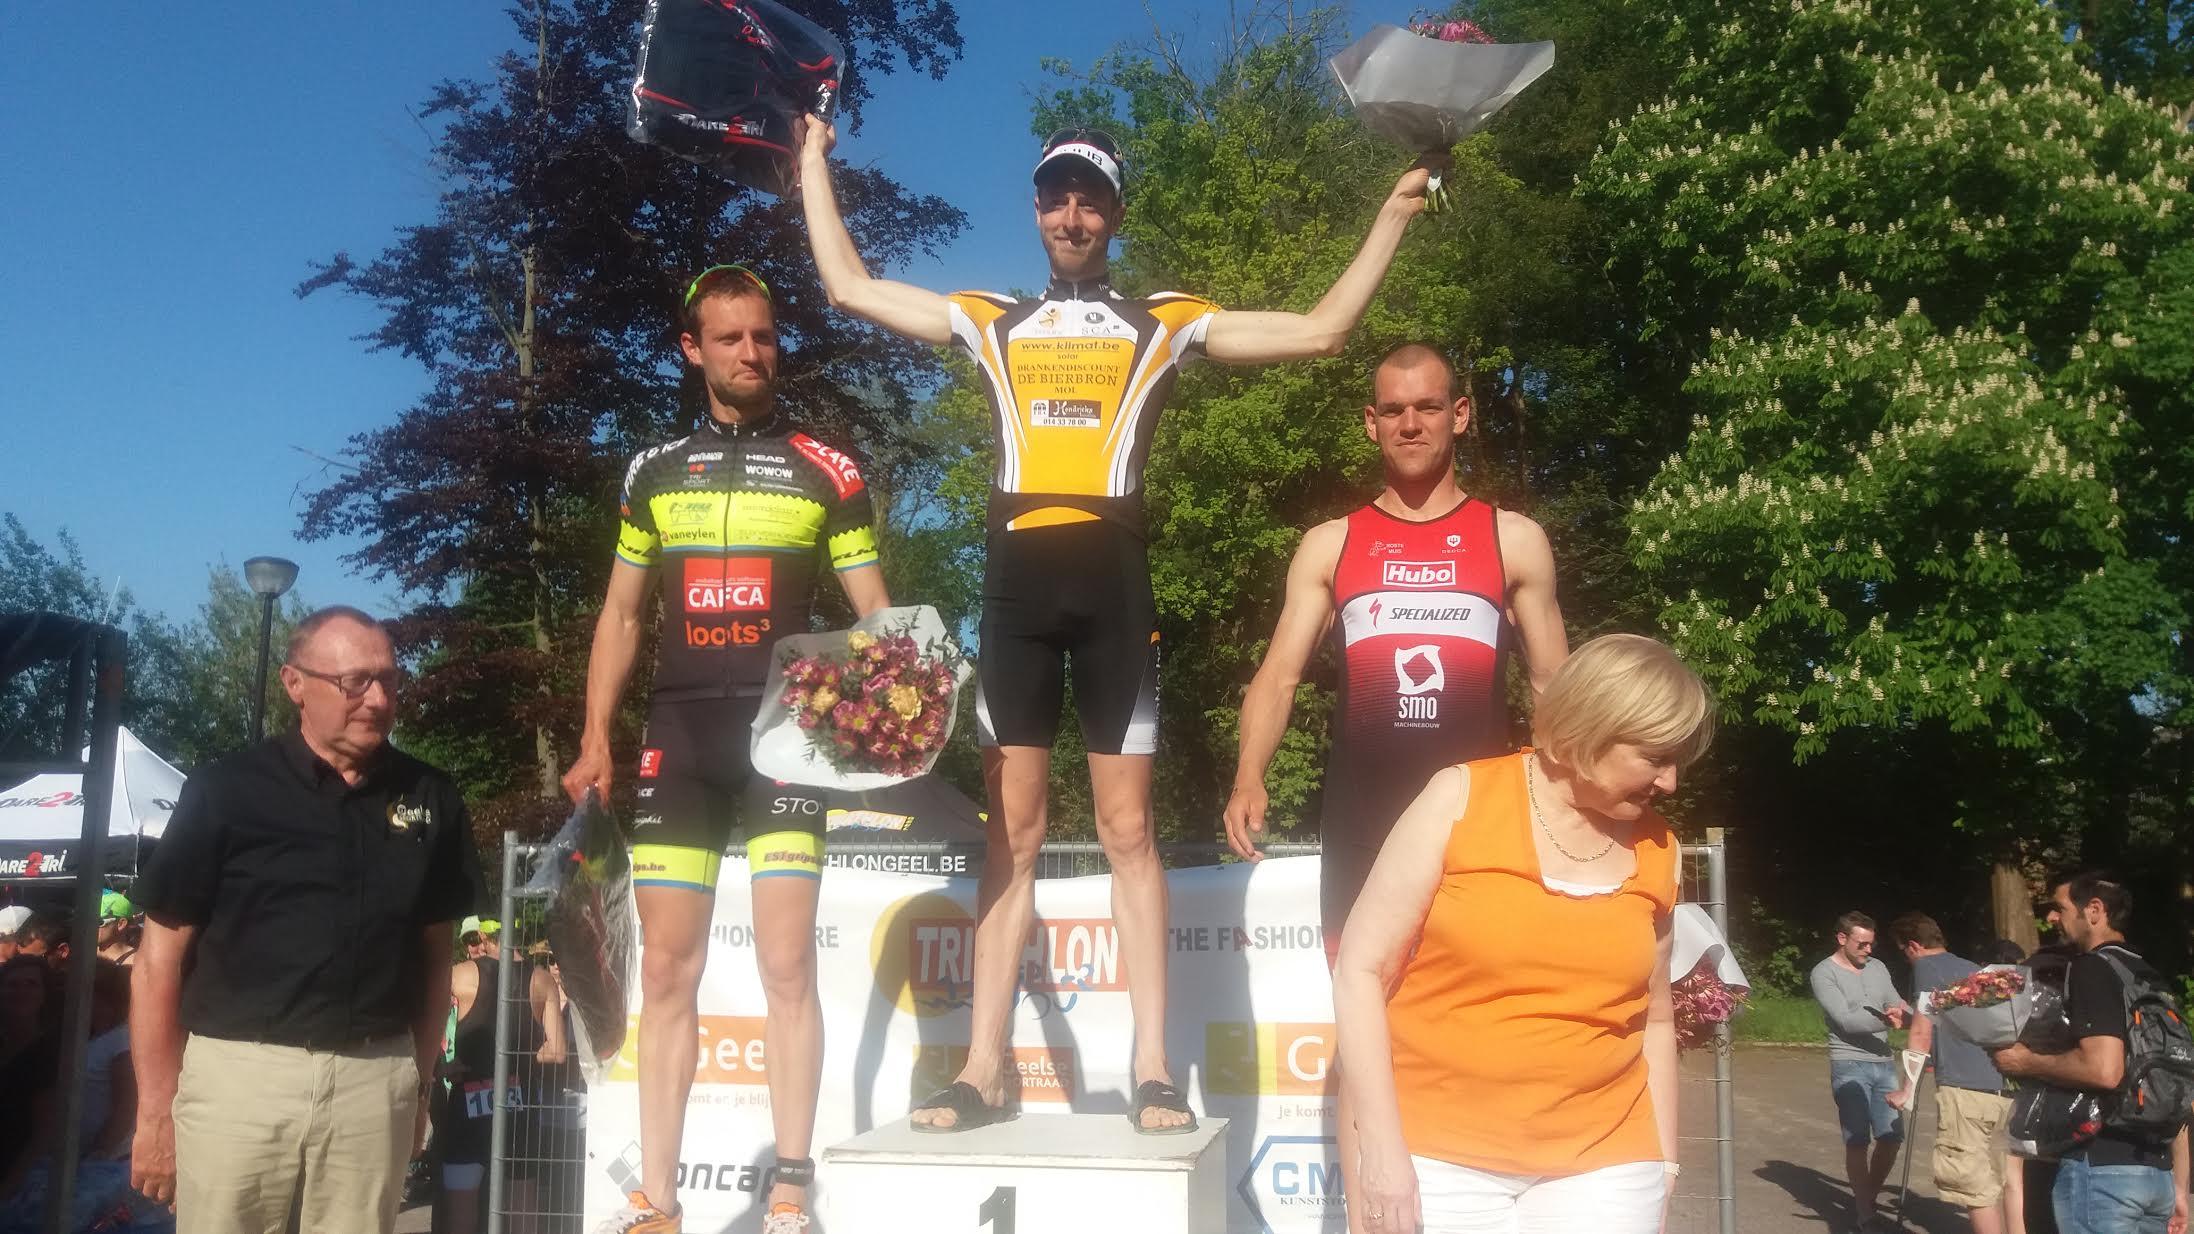 Tim Van Hemel podium Geel 2016